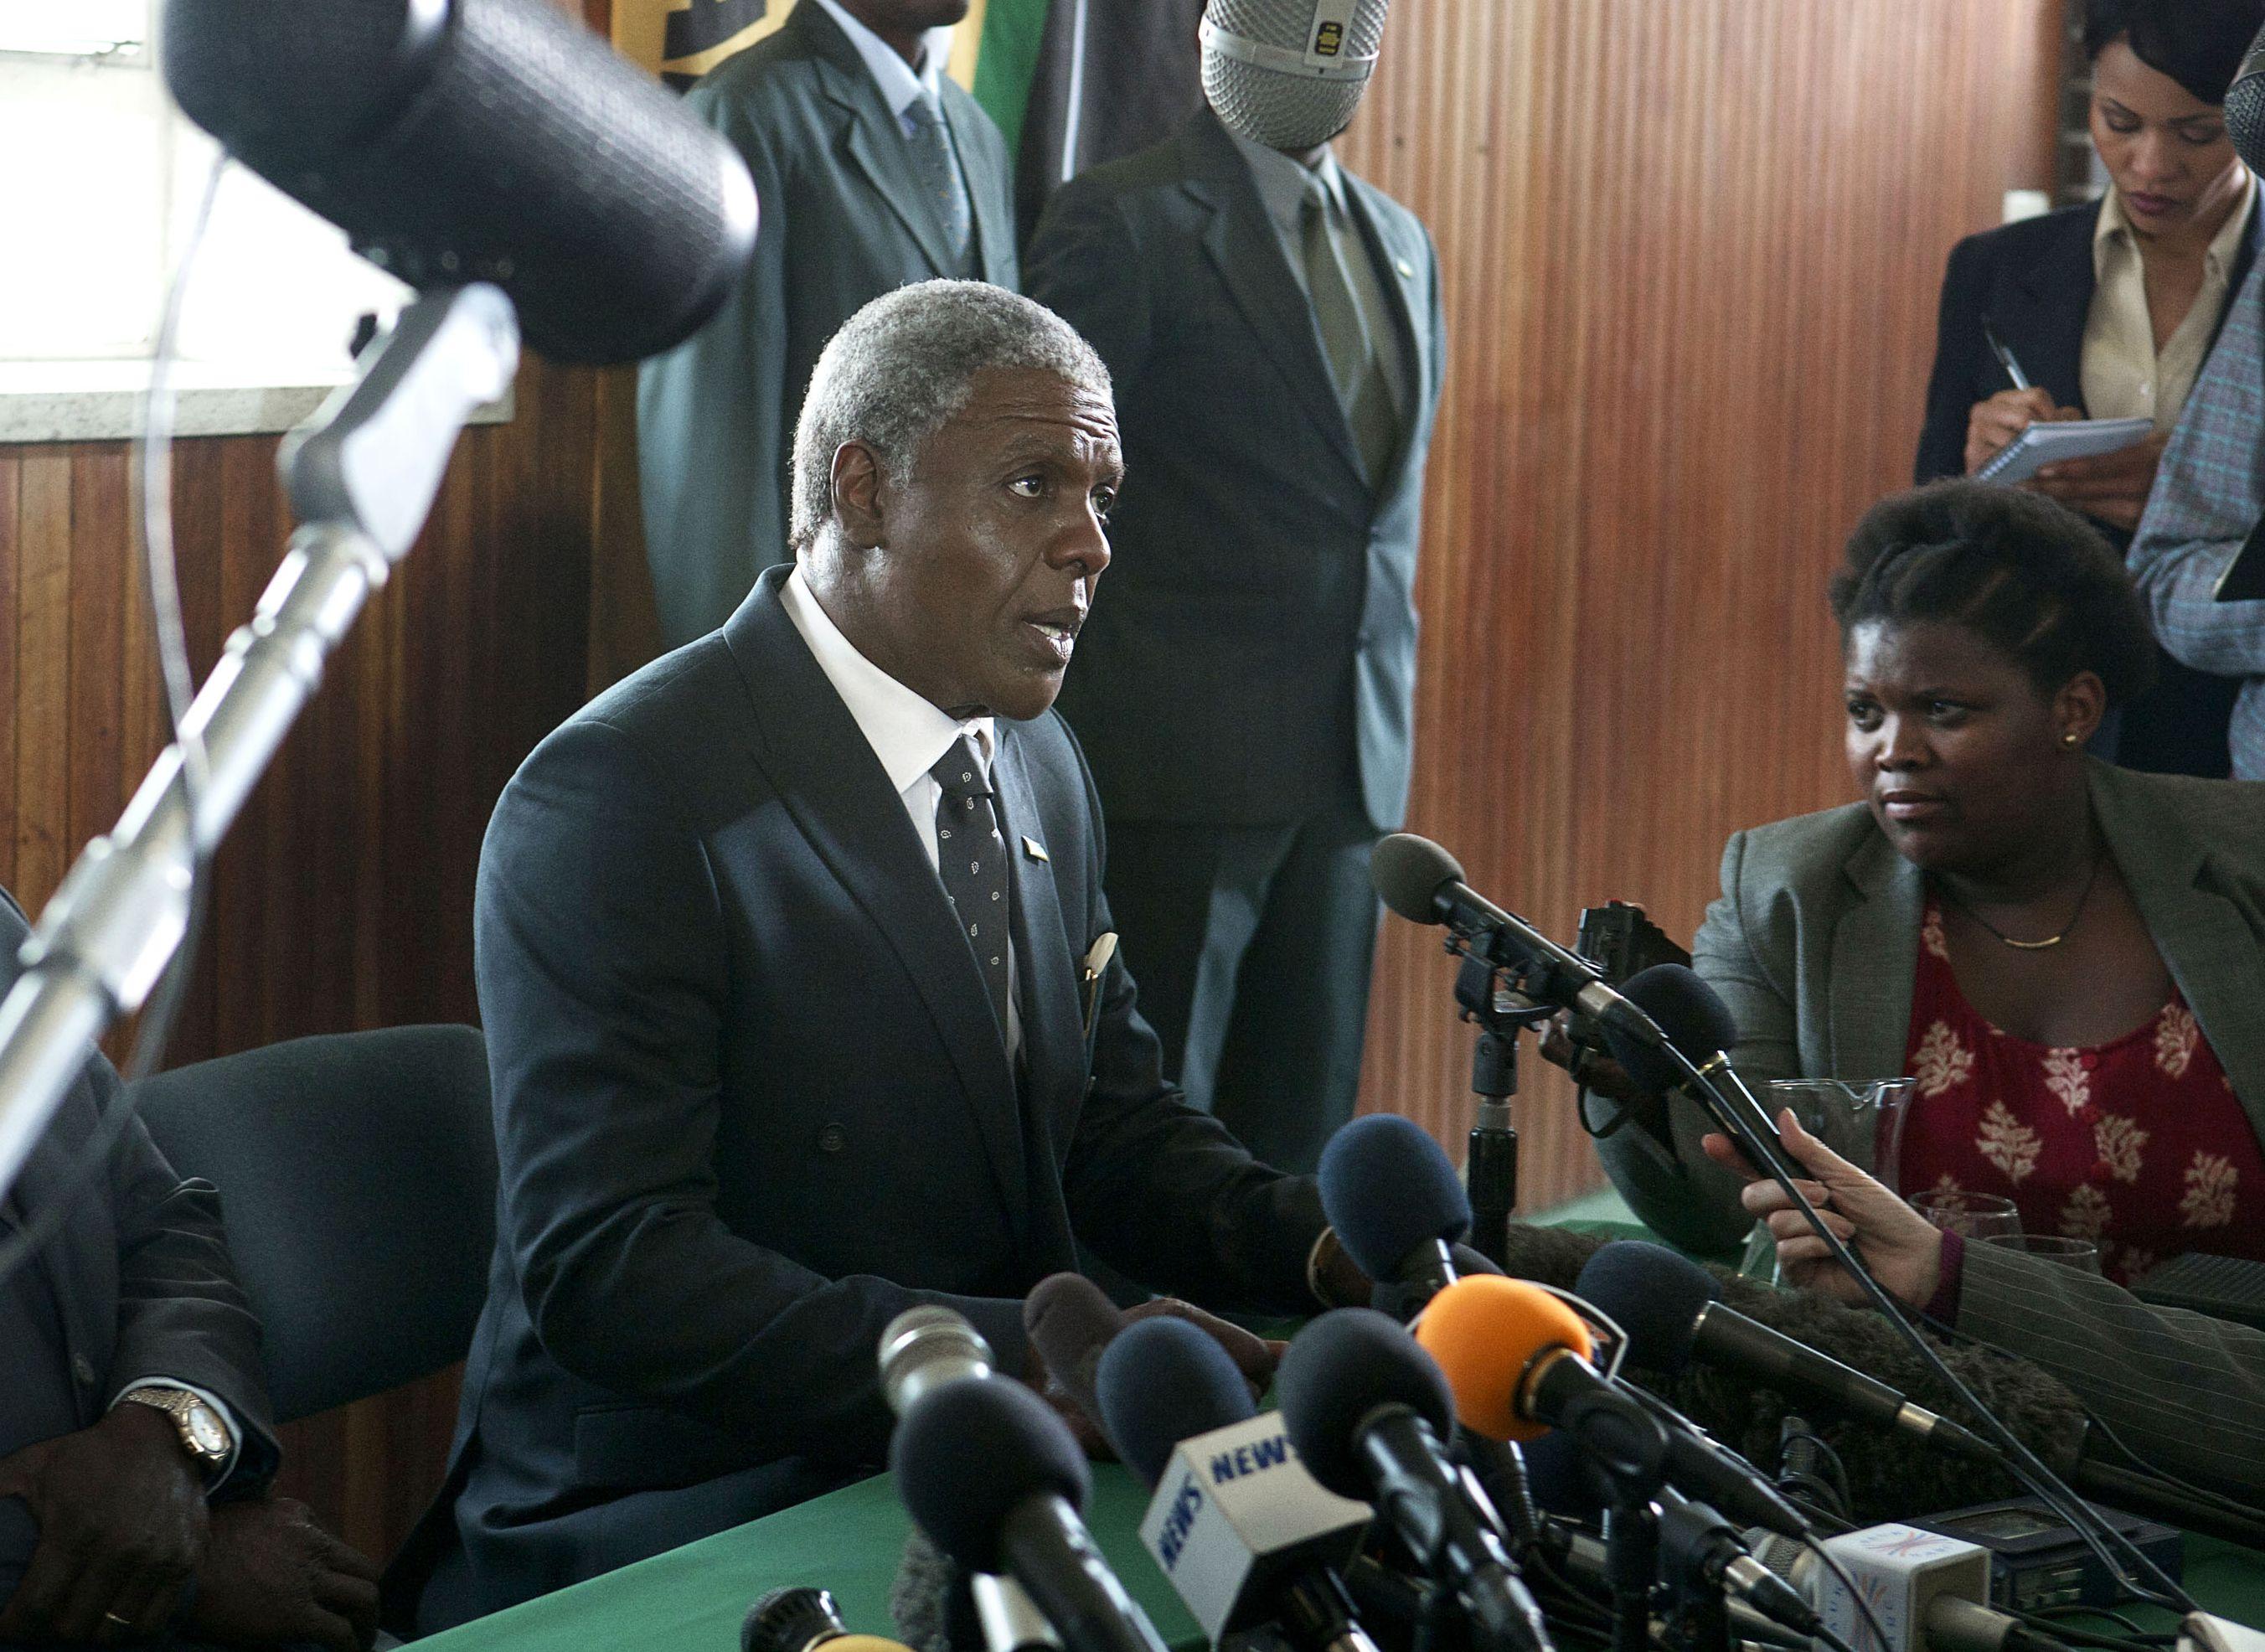 Idris Elba as old Mandela